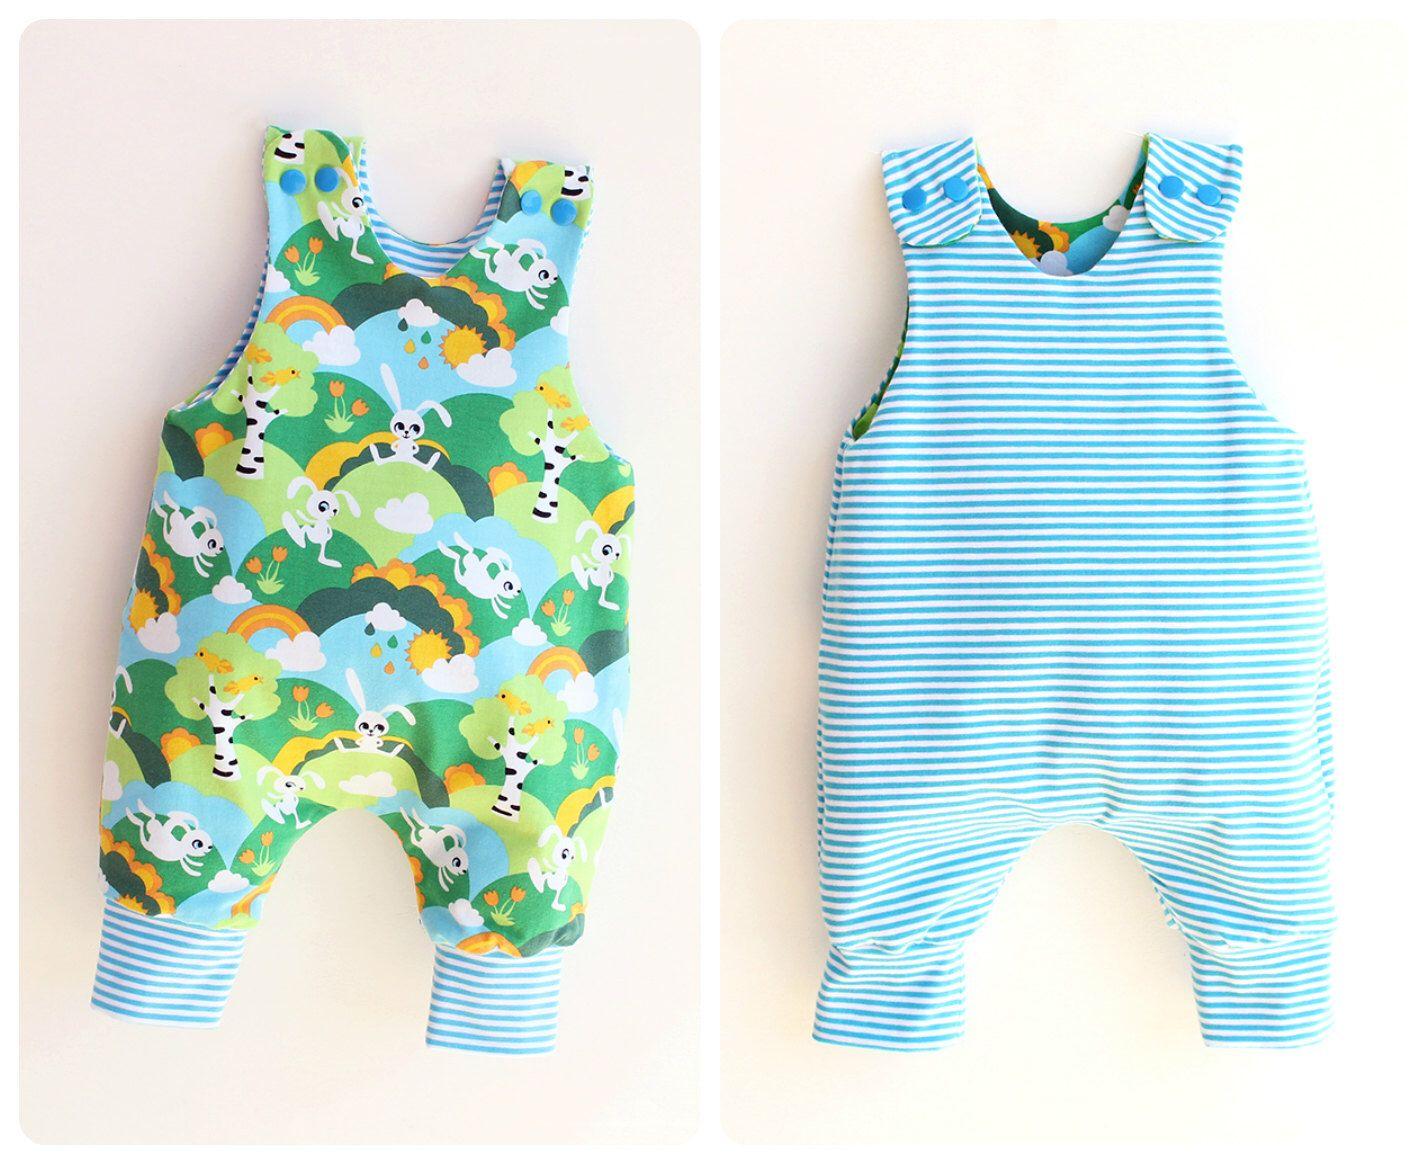 JUMPY Baby Romper sewing pattern, REVERSIBLE Harem romper pattern ...